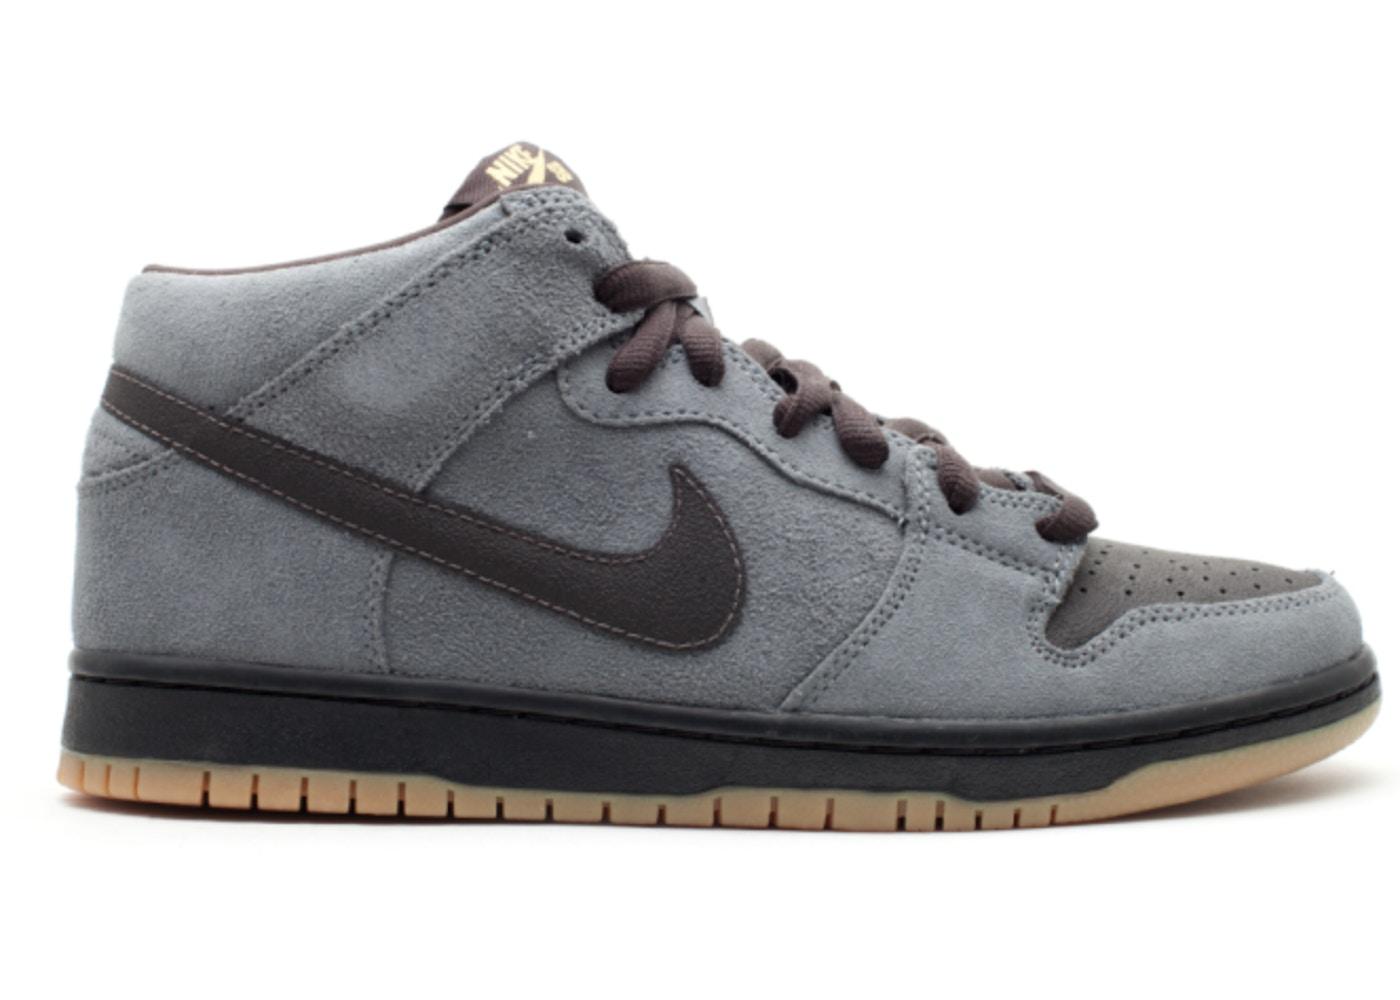 size 40 324a8 ce4c2 Nike Dunk SB Mid Charcoal Tar